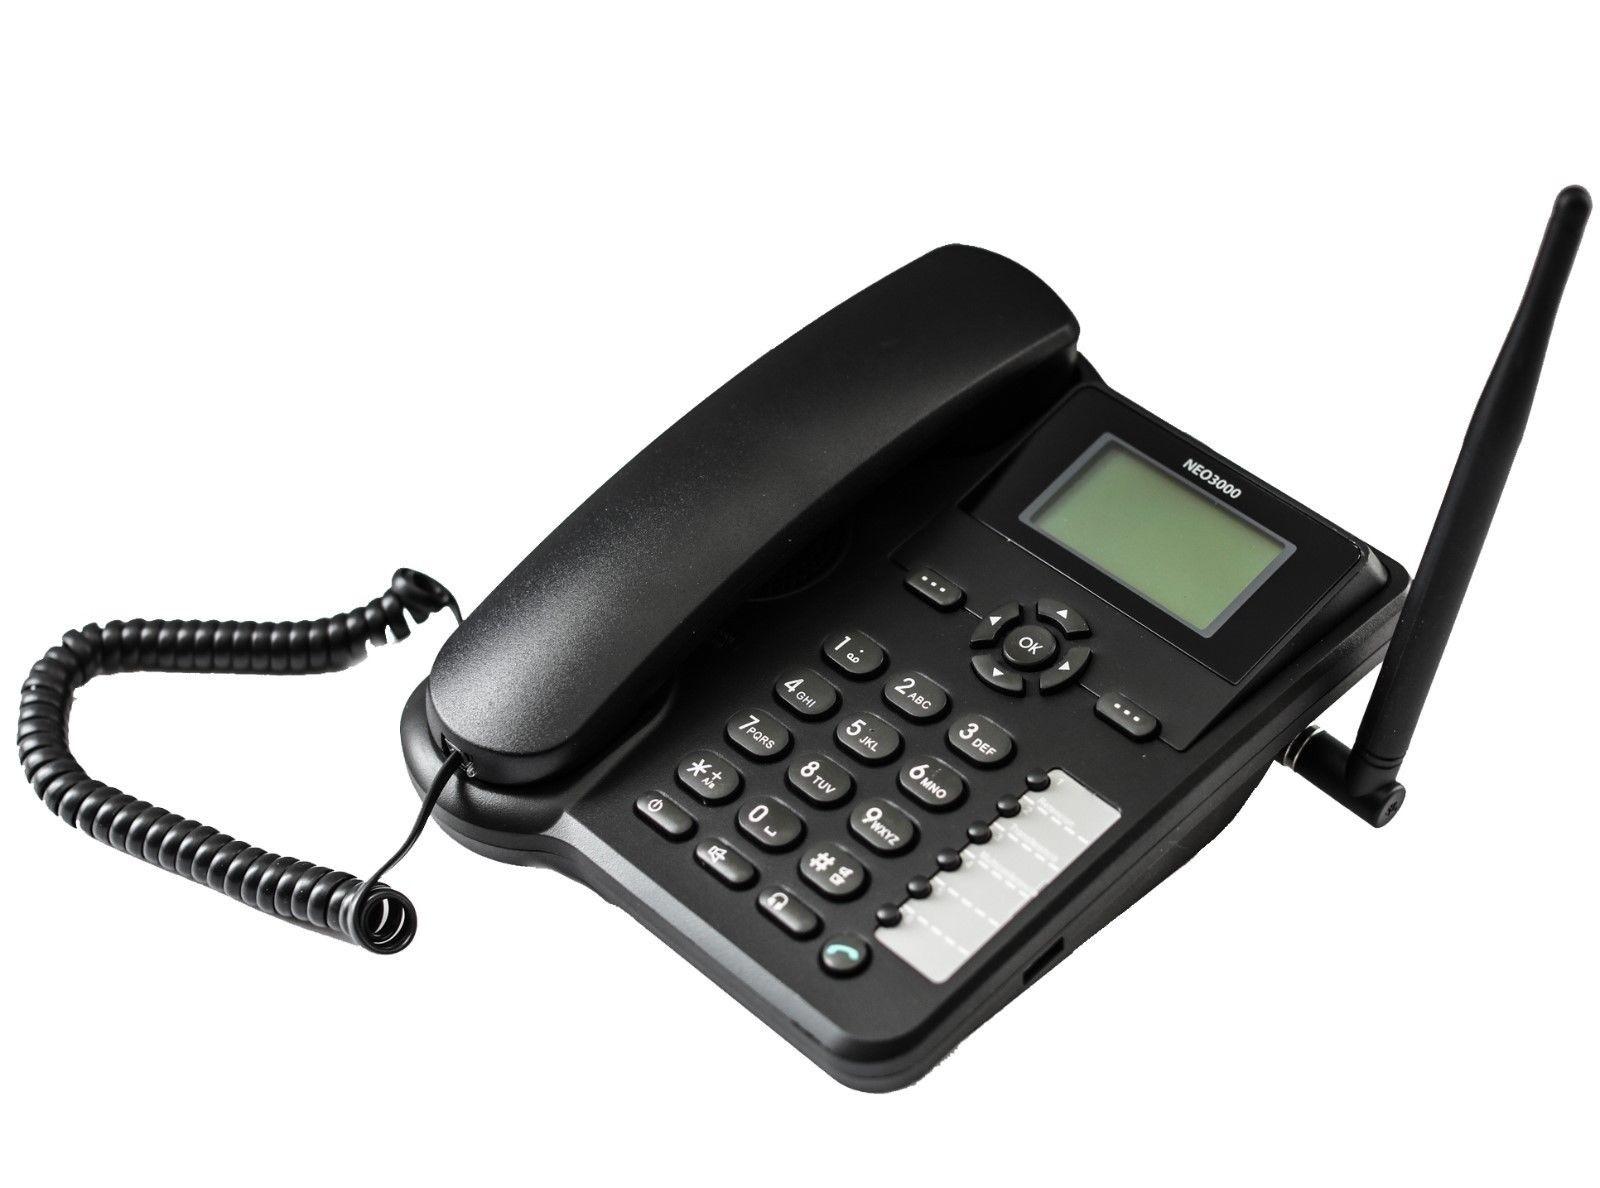 Huawei GSM NEO3000 3G Desk Phone - New